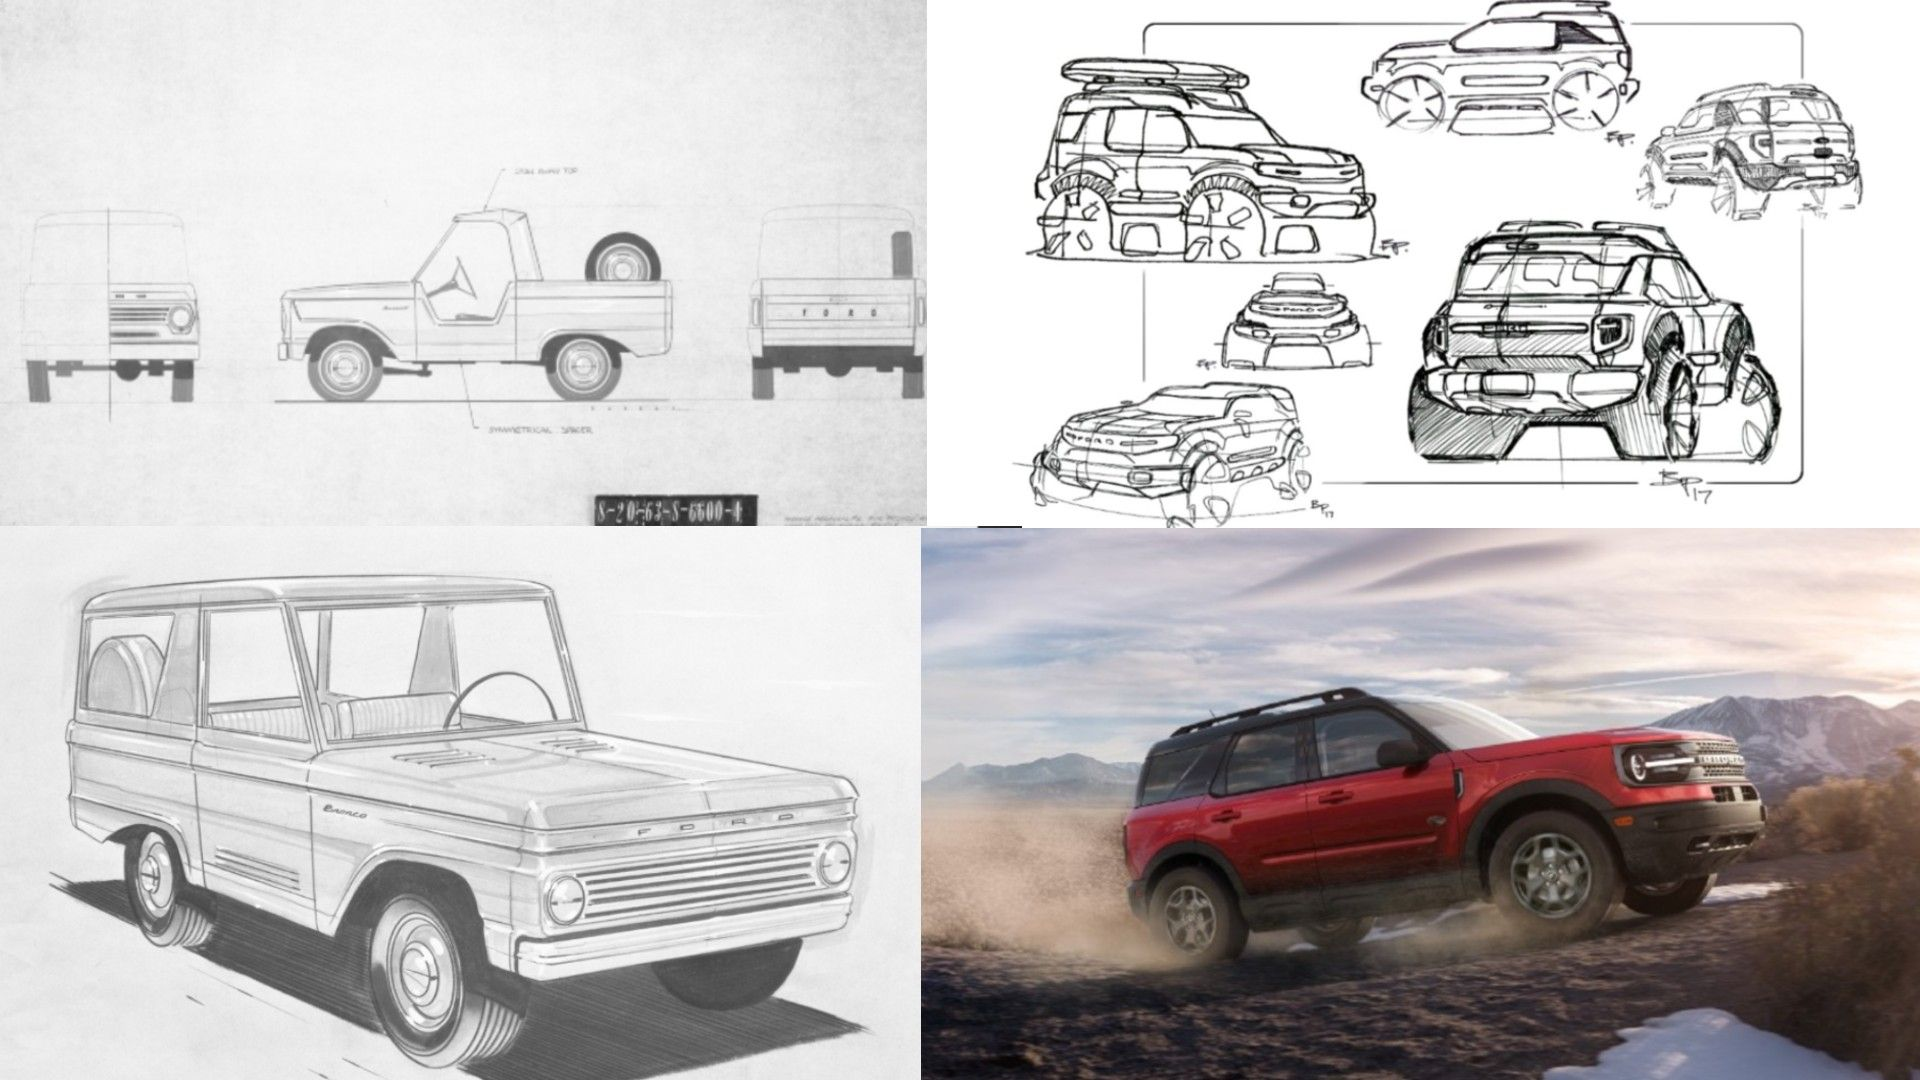 La trama secreta del regreso de la Ford Bronco